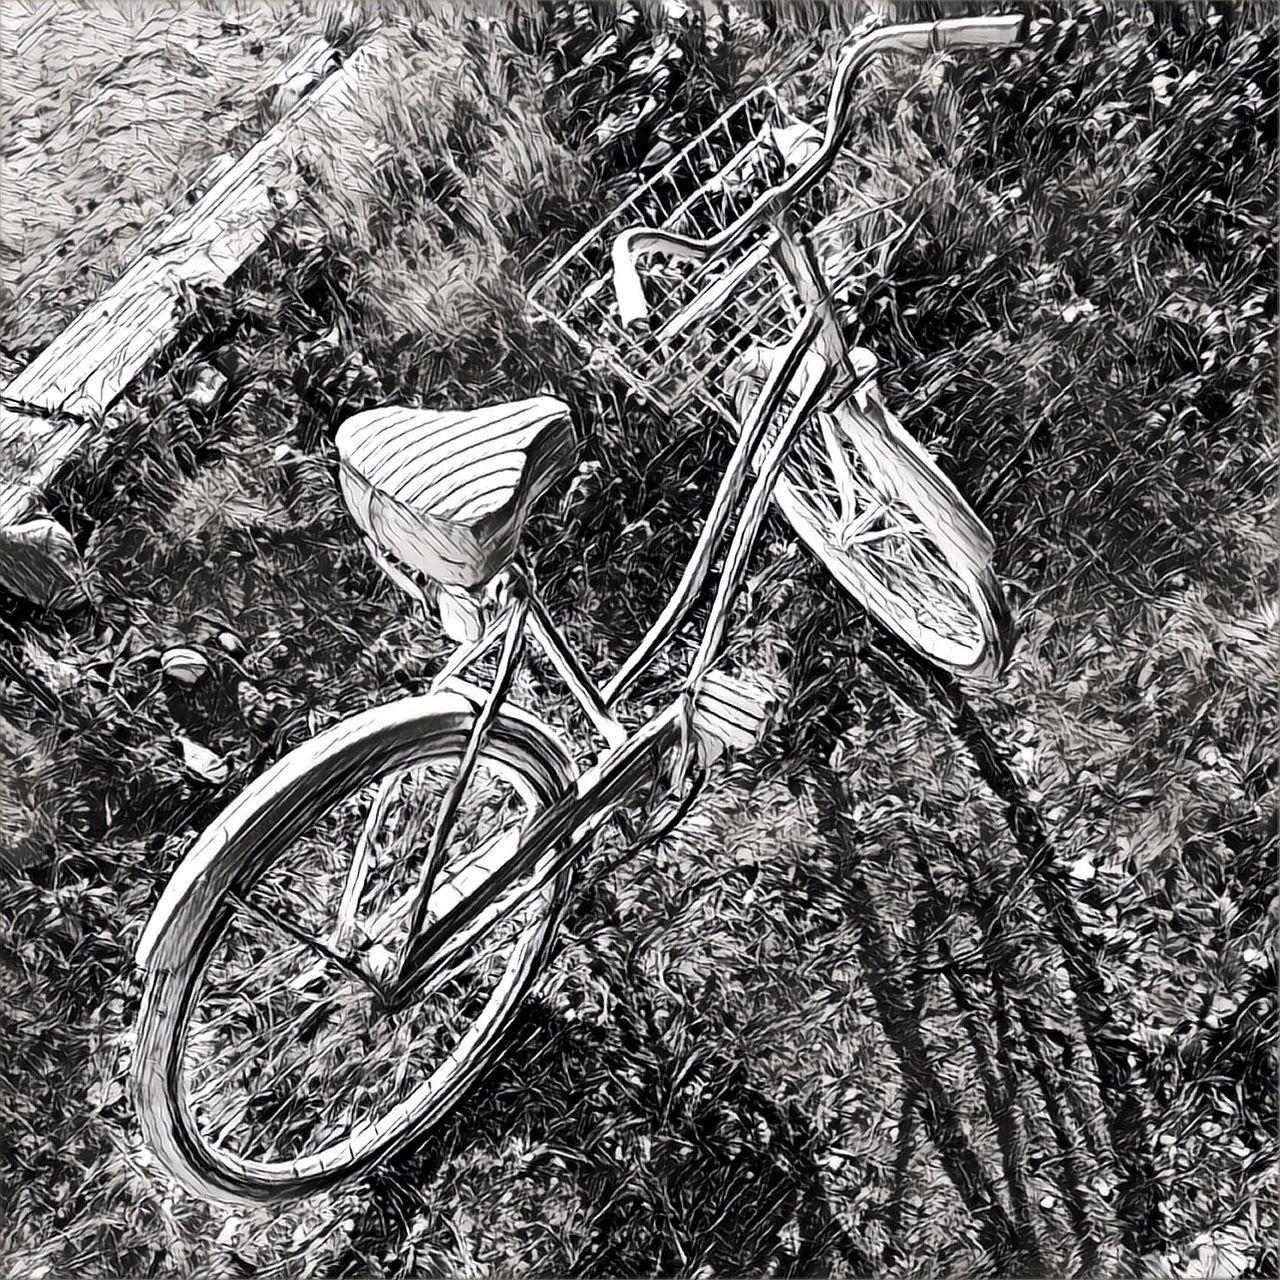 Bicycle Mode Of Transport Land Vehicle High Angle View Transportation Bicycle Basket Shootermagazine Mobiography Malephotographerofthemonth Youmobile Streamzoofamily Shootermag_usa IPhone7Plus Blackandwhite Black And White EyeEm Best Shots - Black + White Monochrome